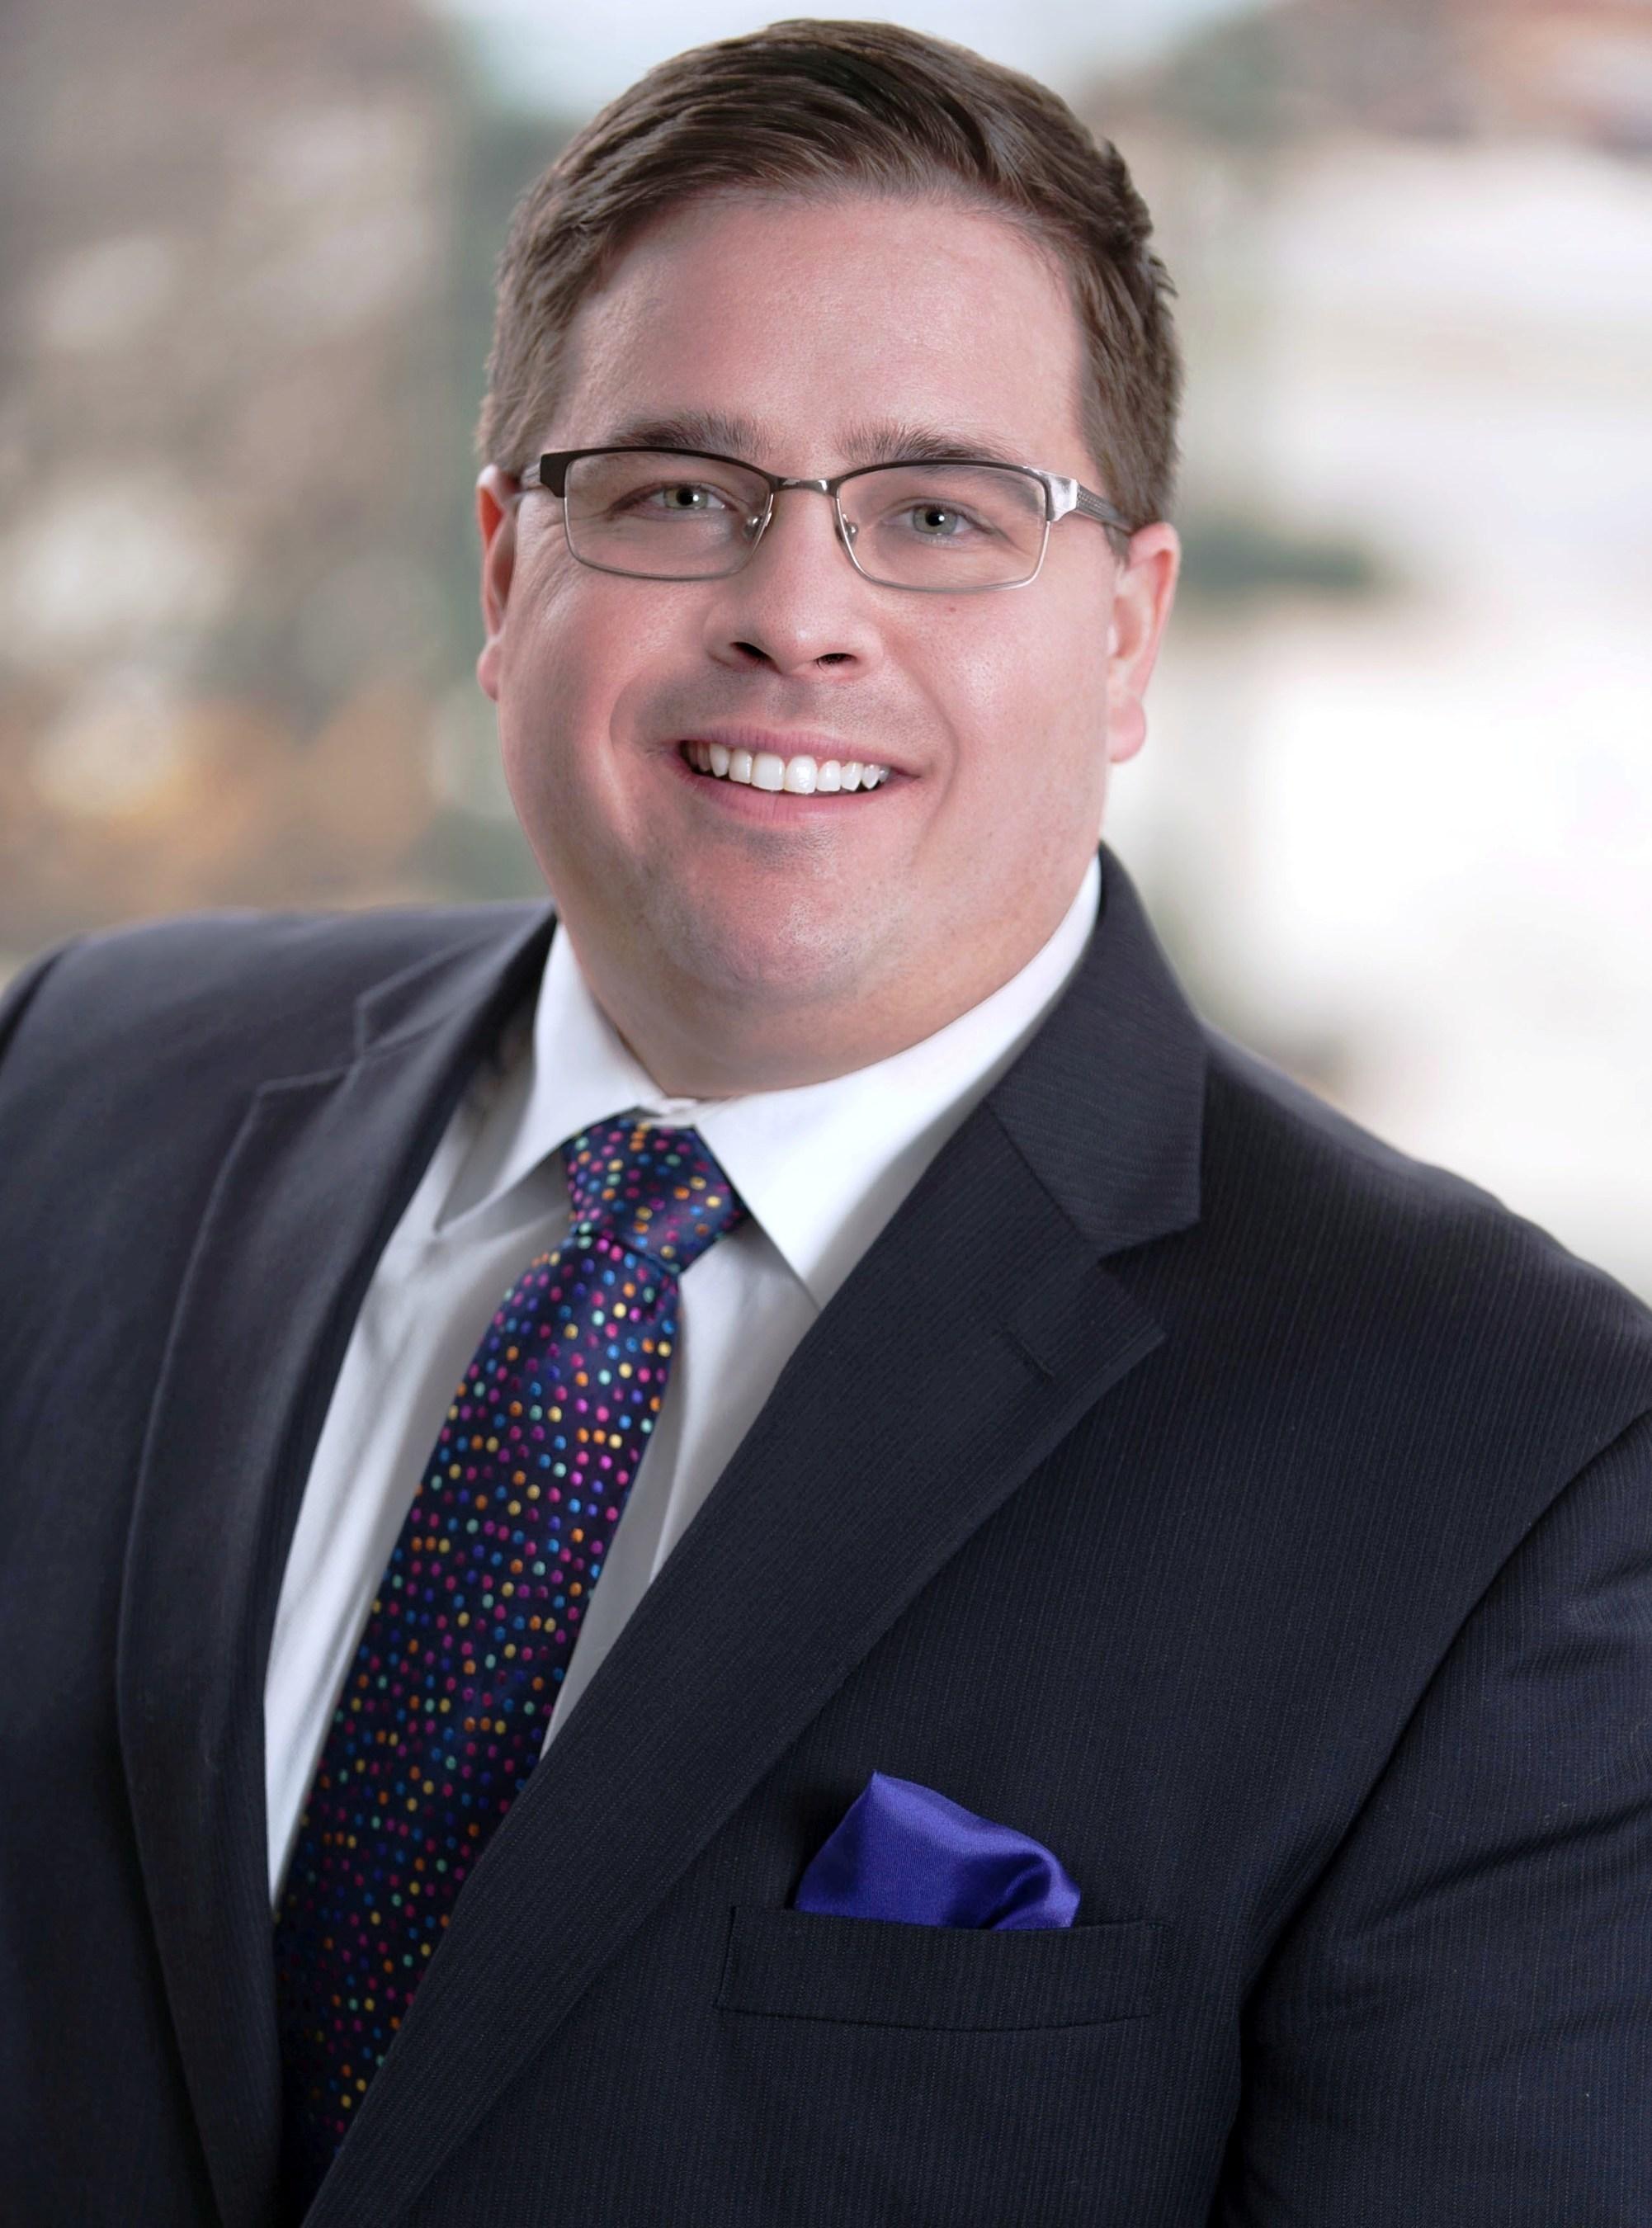 Ryan Plecha